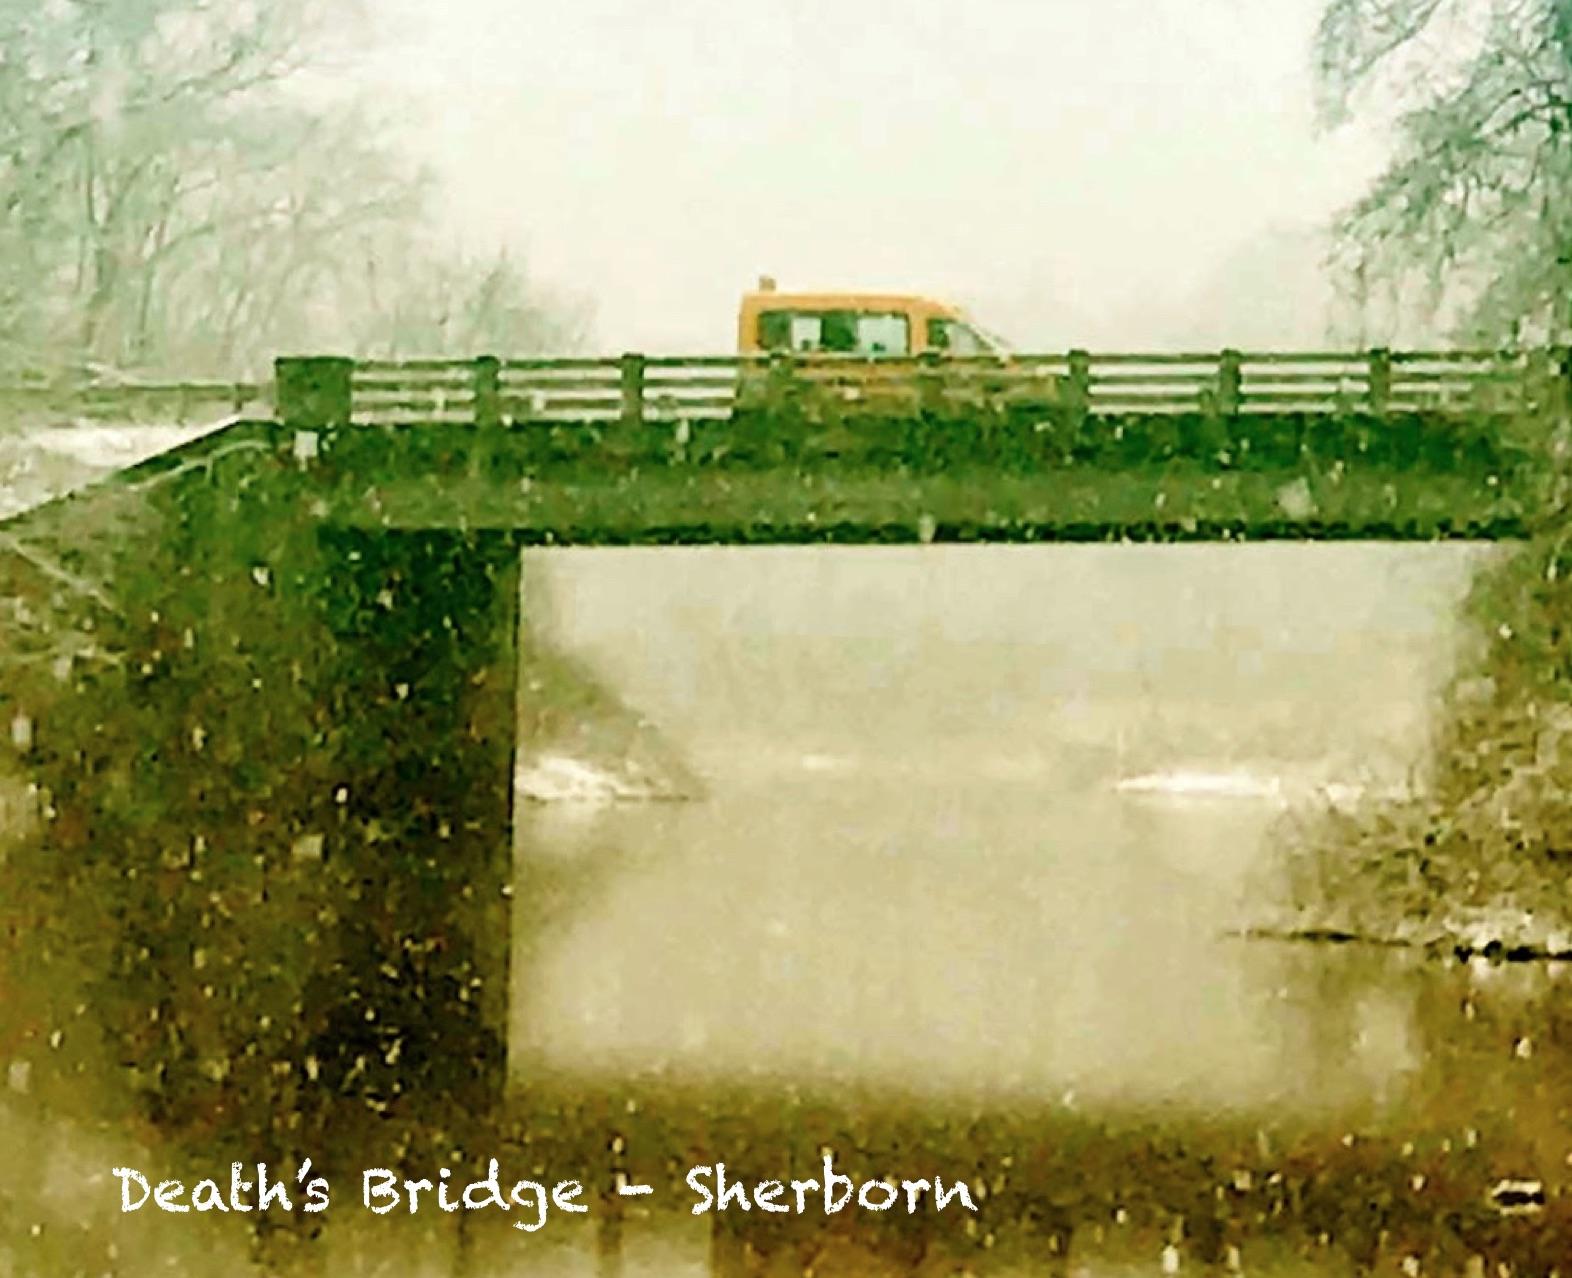 Death's Bridge, Sherborn/Medfield Line, Charles River, Route 27